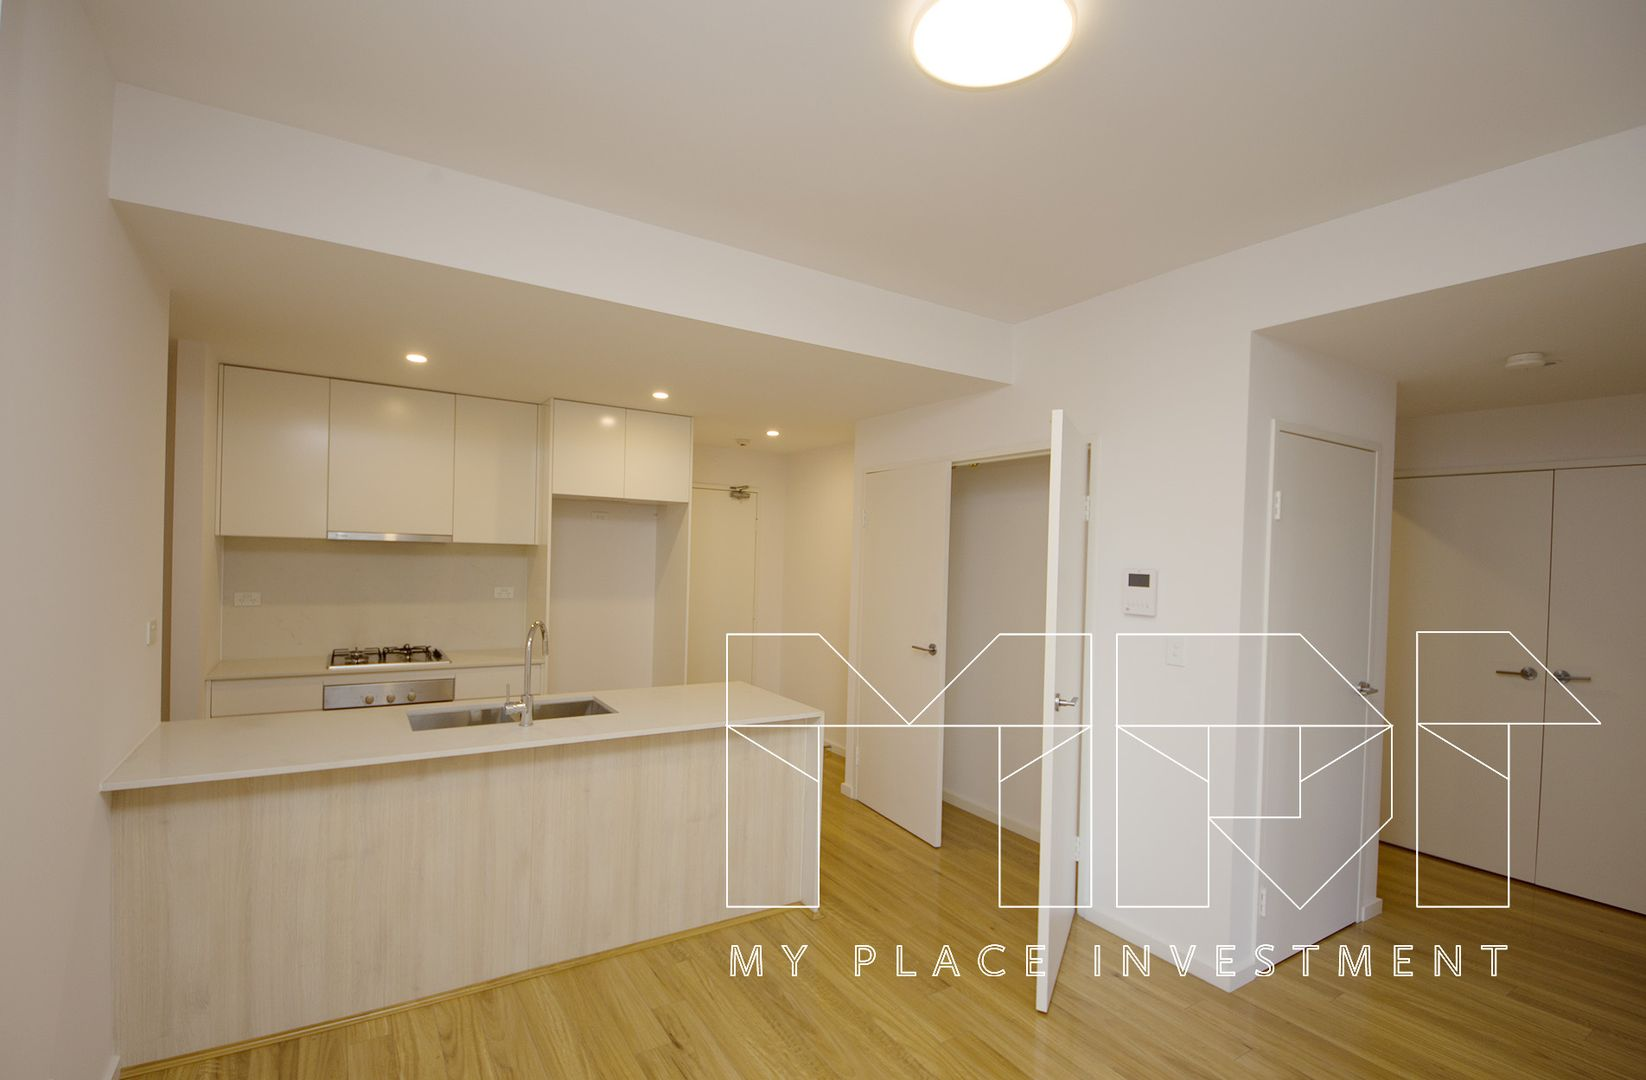 18/35 Devlin St, Ryde NSW 2112, Image 0